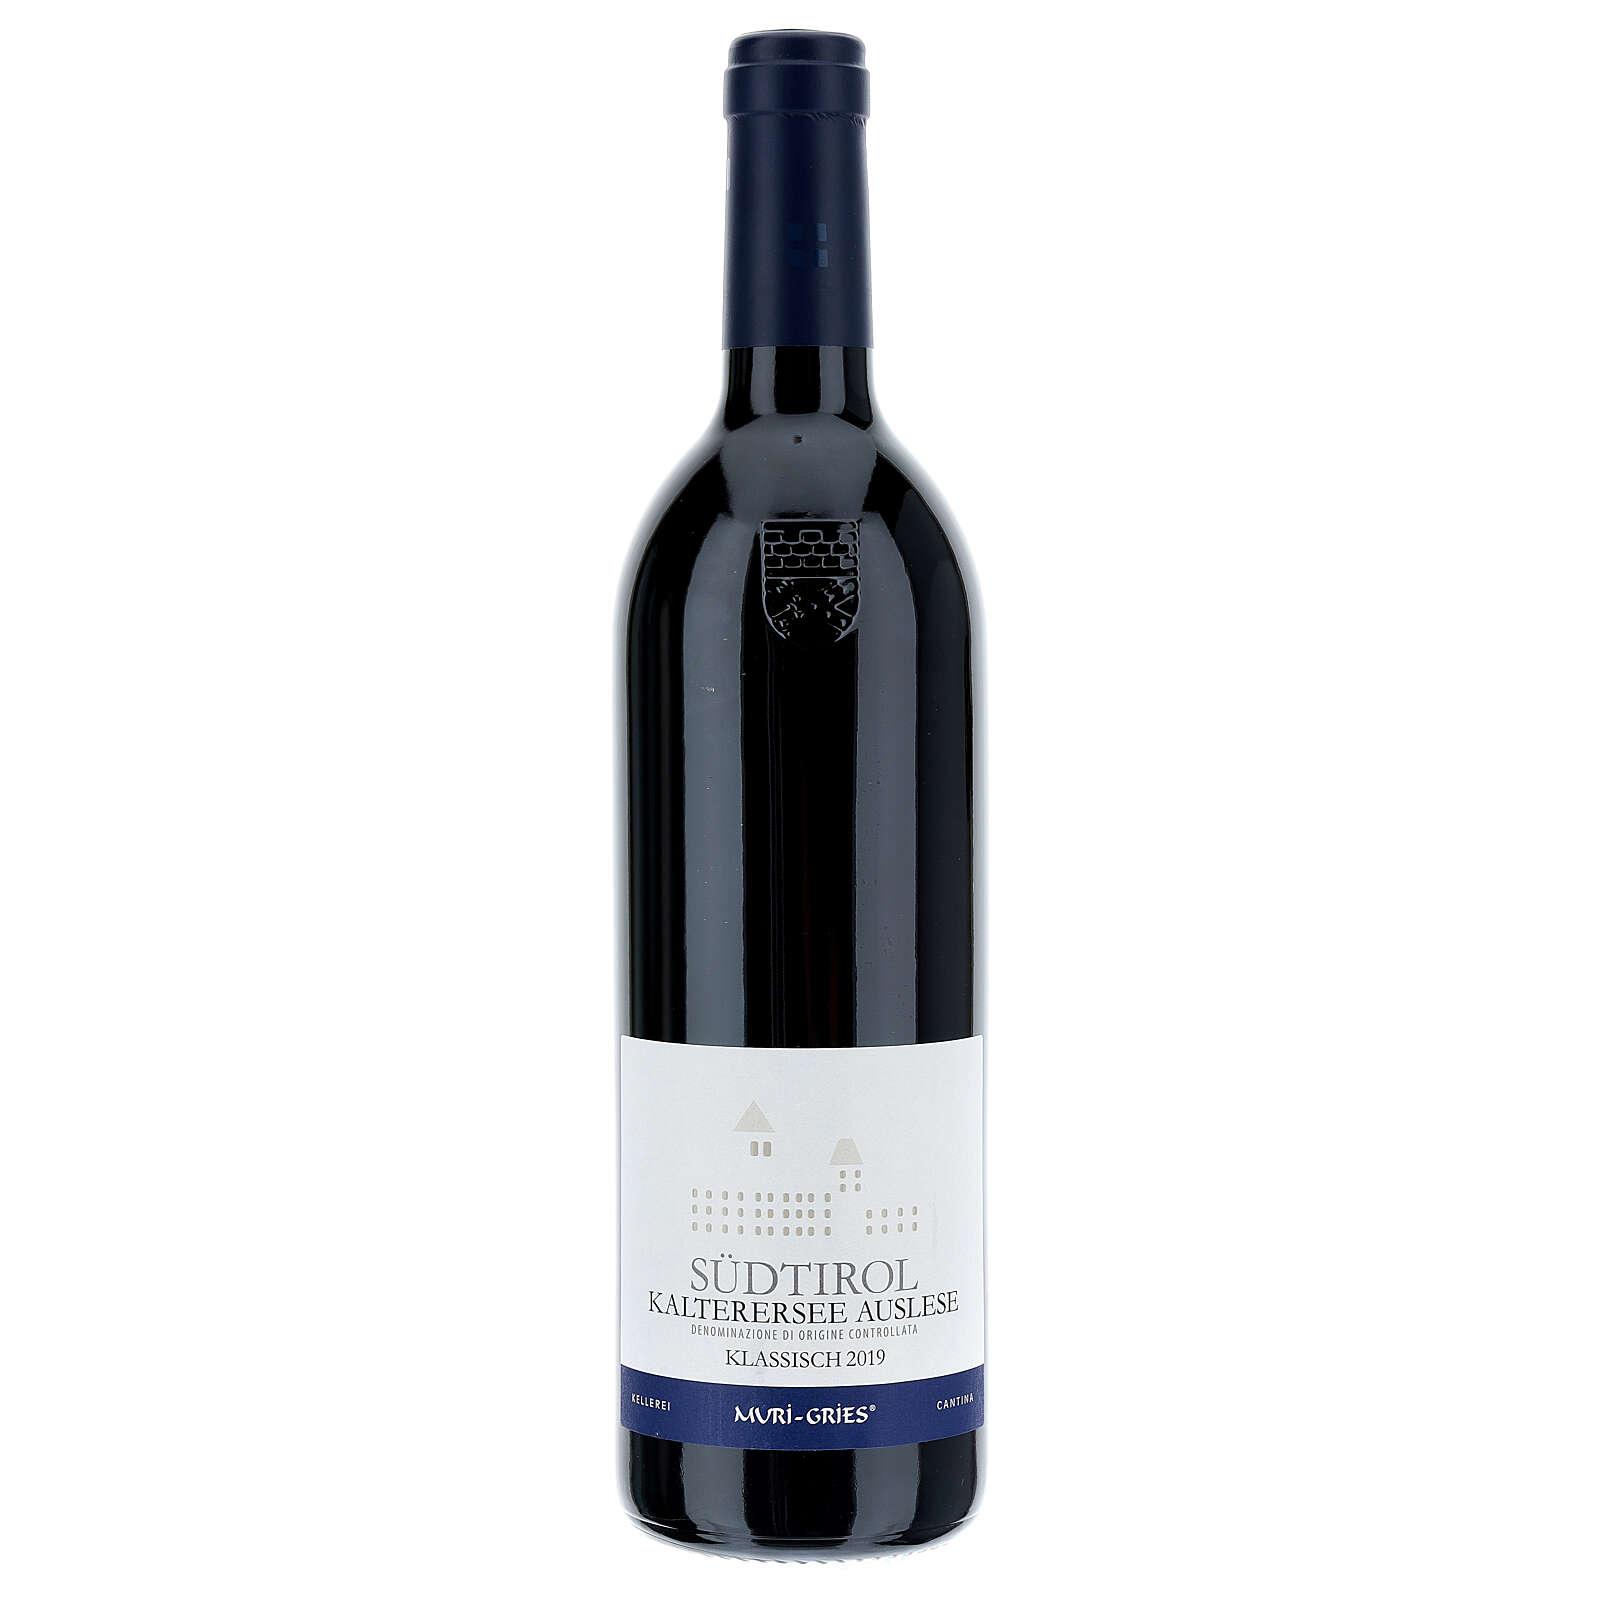 Vinho Lago de Caldaro DOC 2019 Abadia Muri Gries 750 ml 3